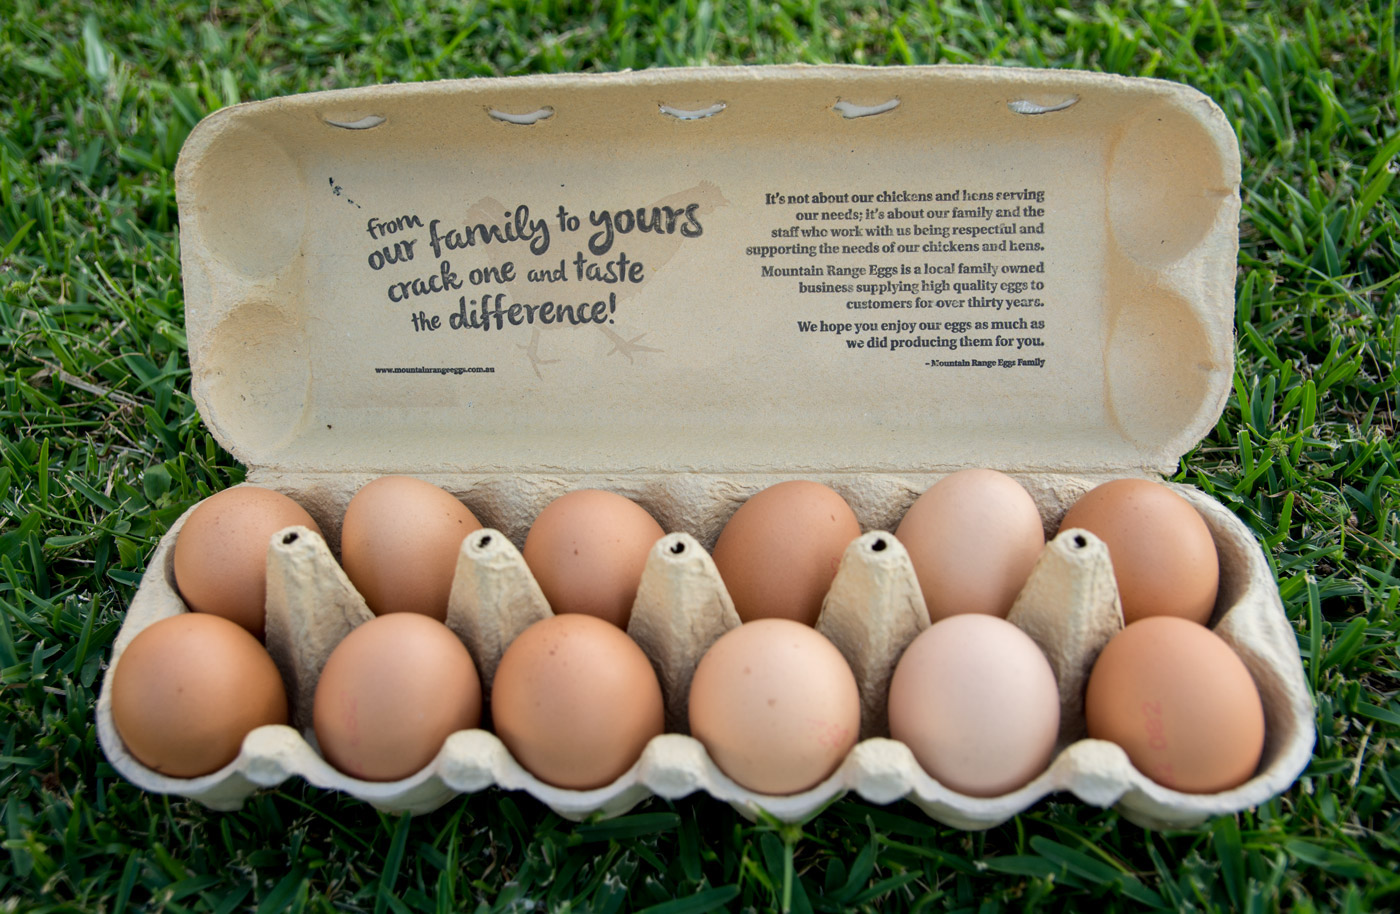 eggs eggs packaging free range Illustrative Fun hard drawn